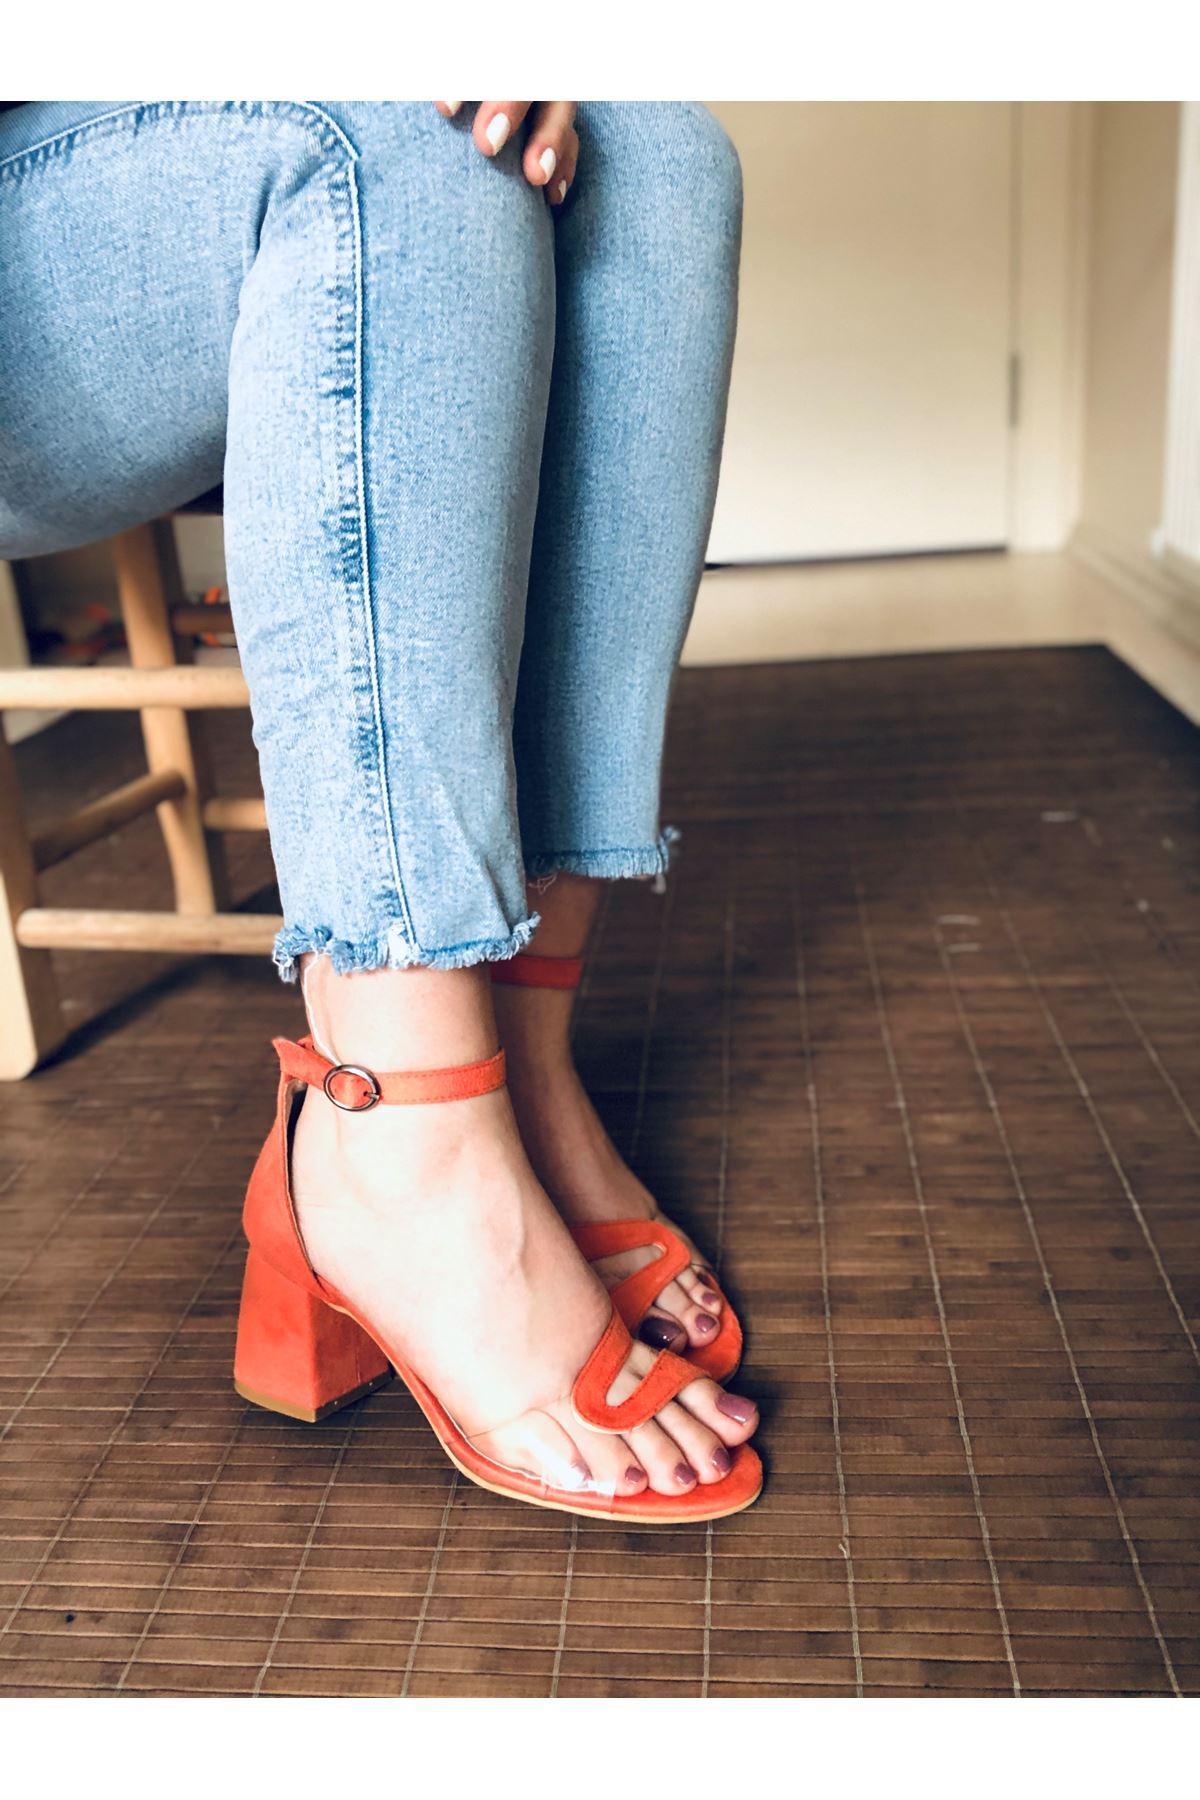 Y610 Turuncu Suet Topuklu Ayakkabı